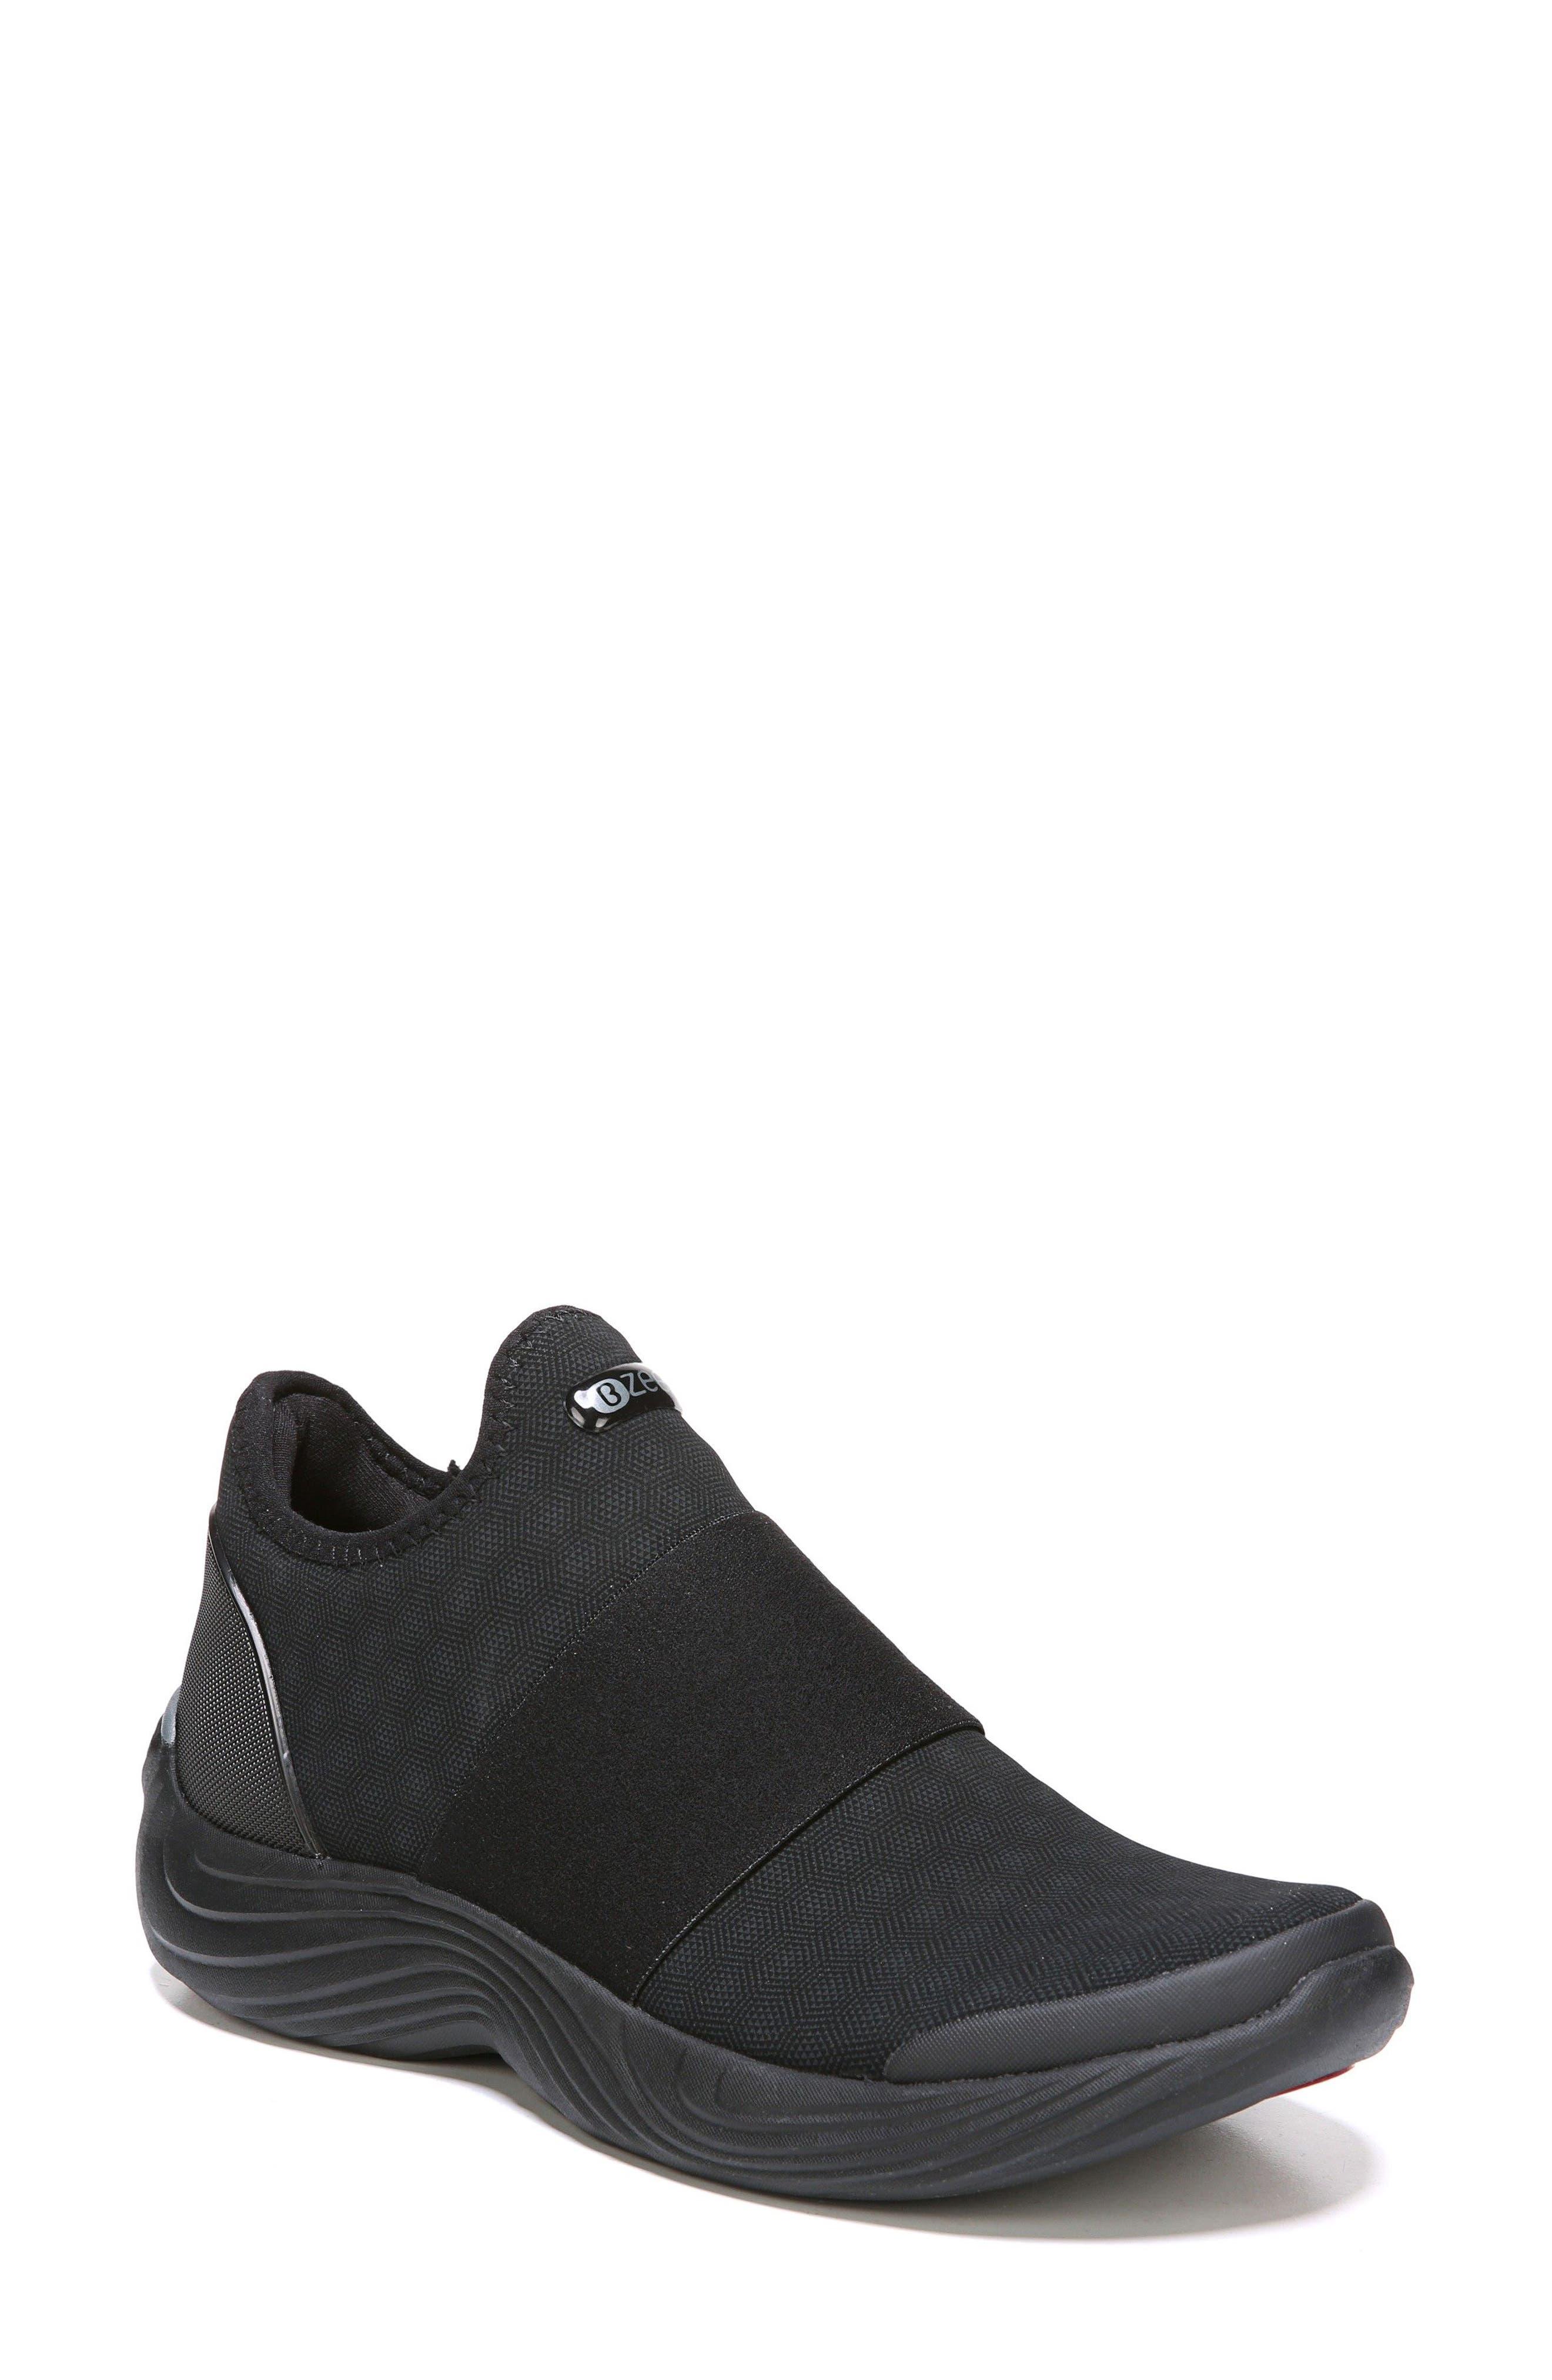 Terri Slip-On Sneaker,                         Main,                         color, 001